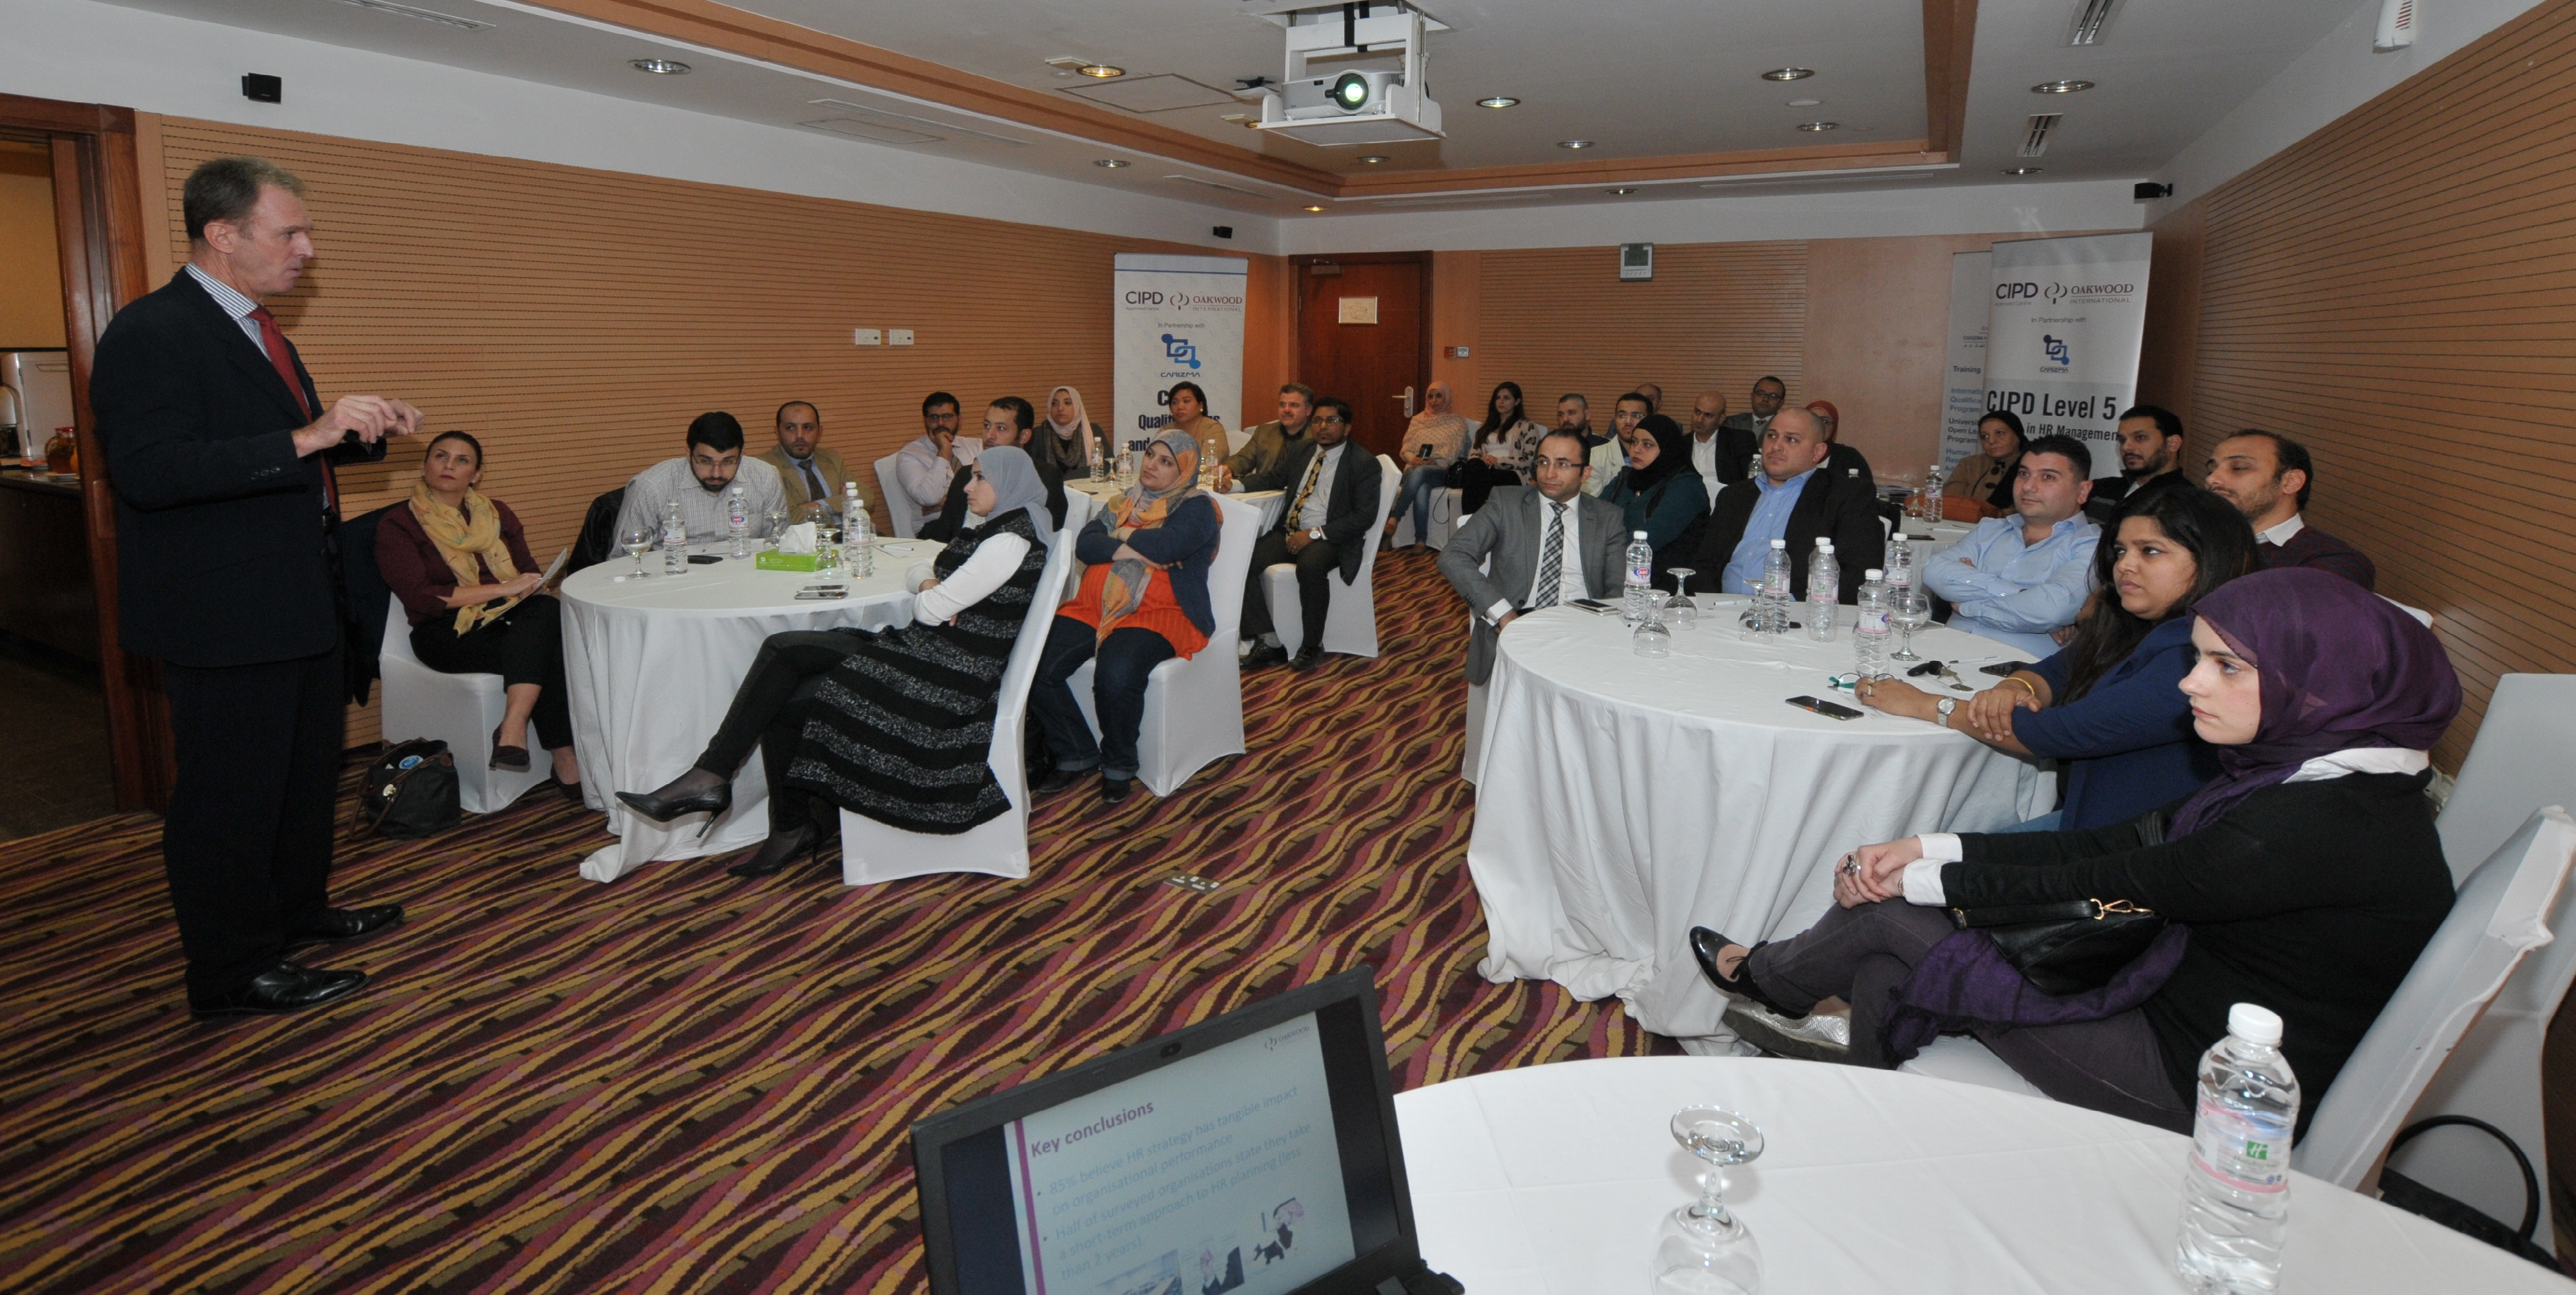 cipd seminar